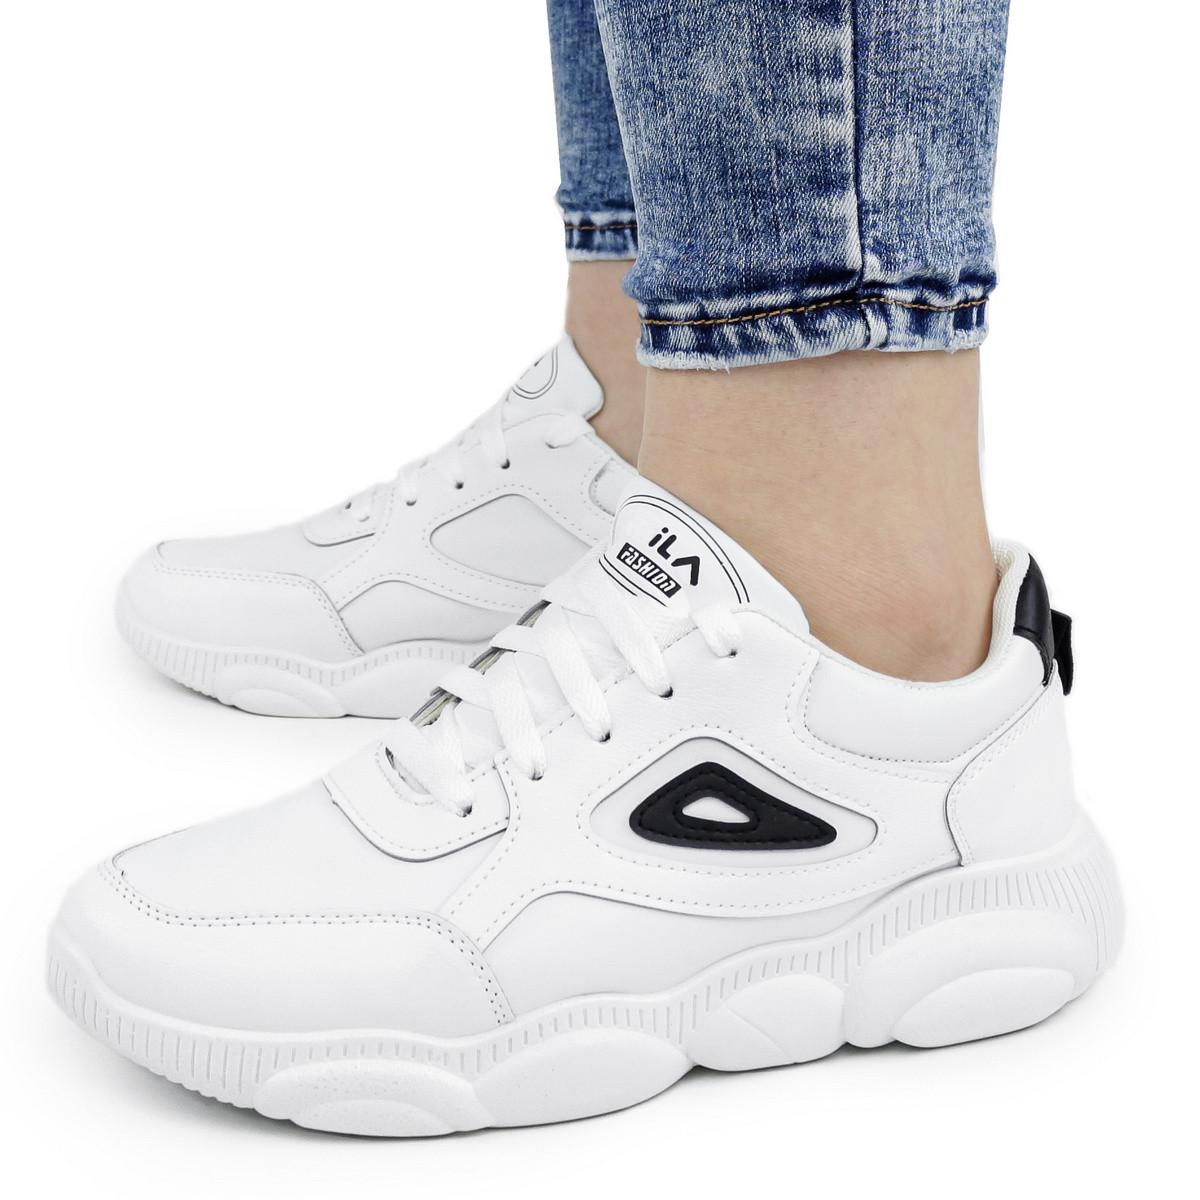 Женские кроссовки Dual ILA Fashion белые весна-осень 38 р. - 24,5 см (1341603274)